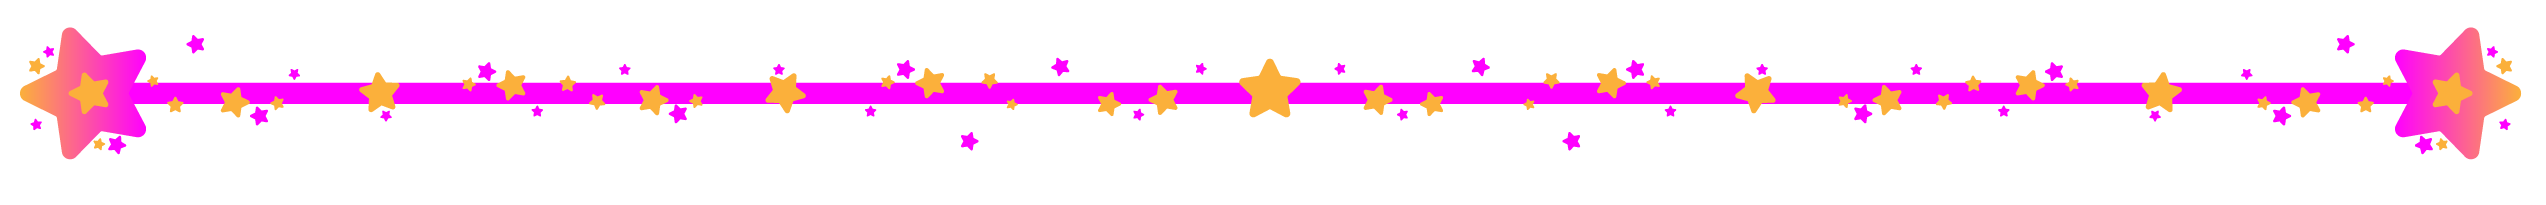 Orange_Pink_star_dividers-01.png